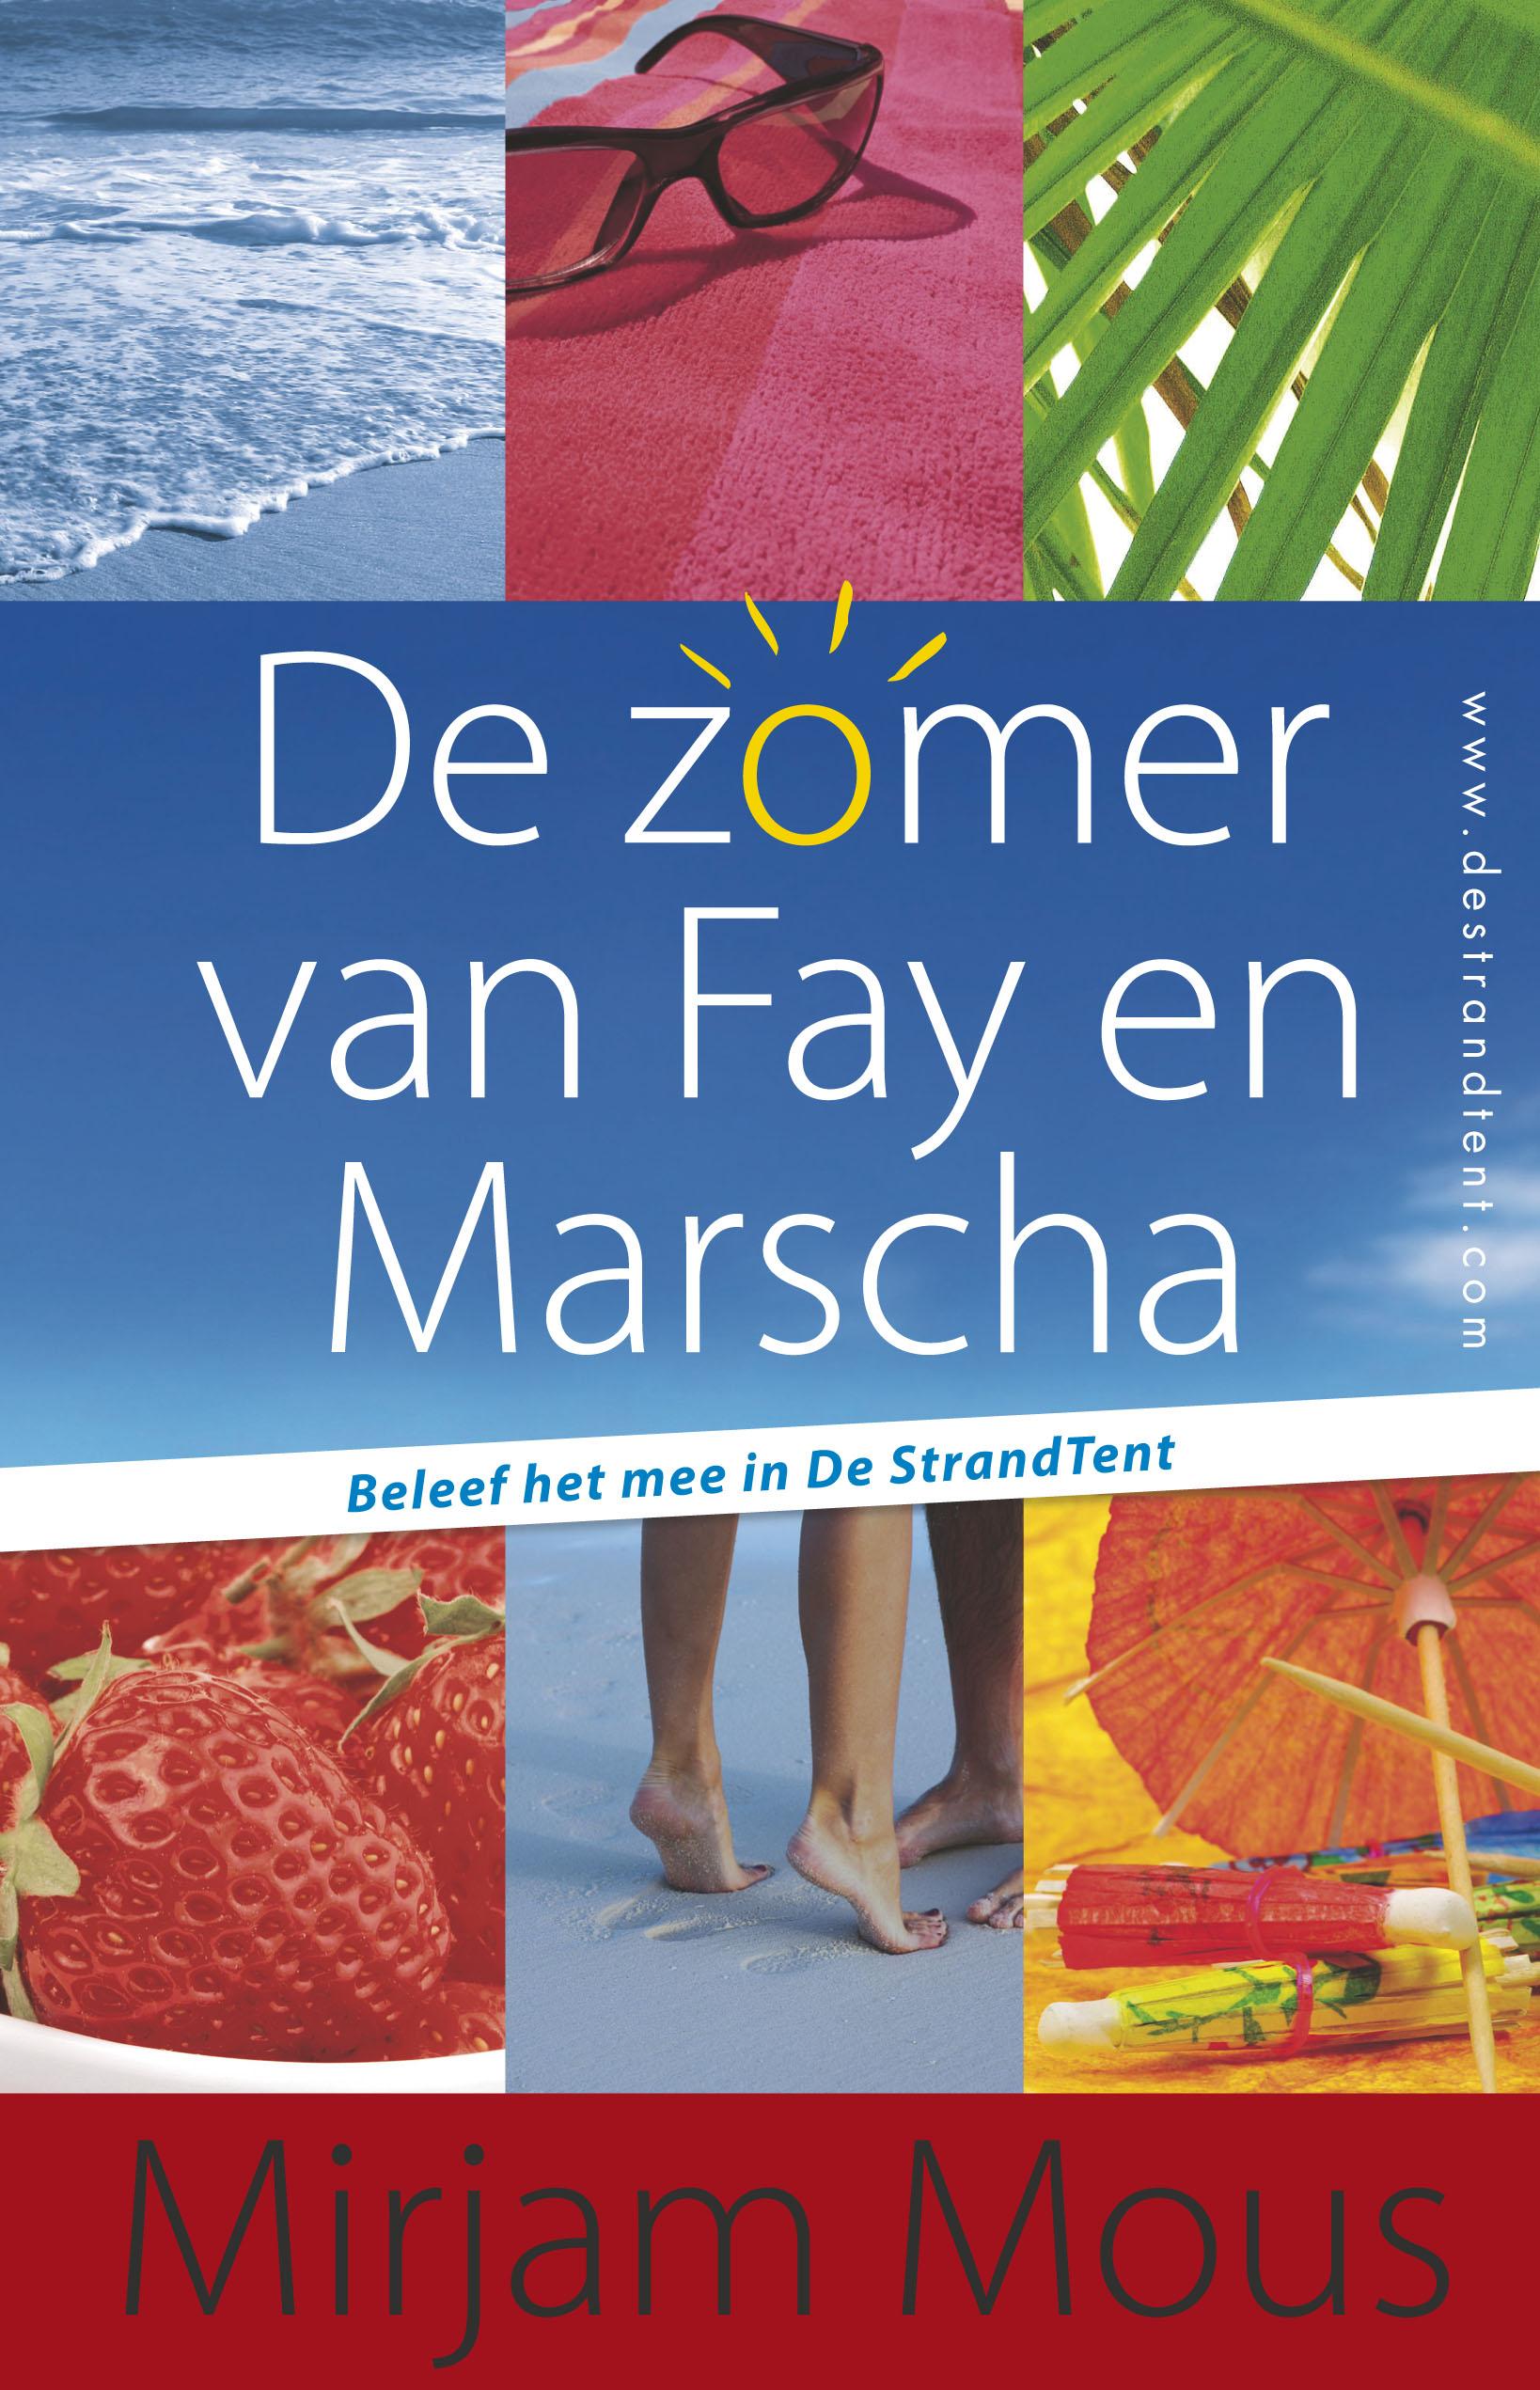 De zomer van Fay en Marscha